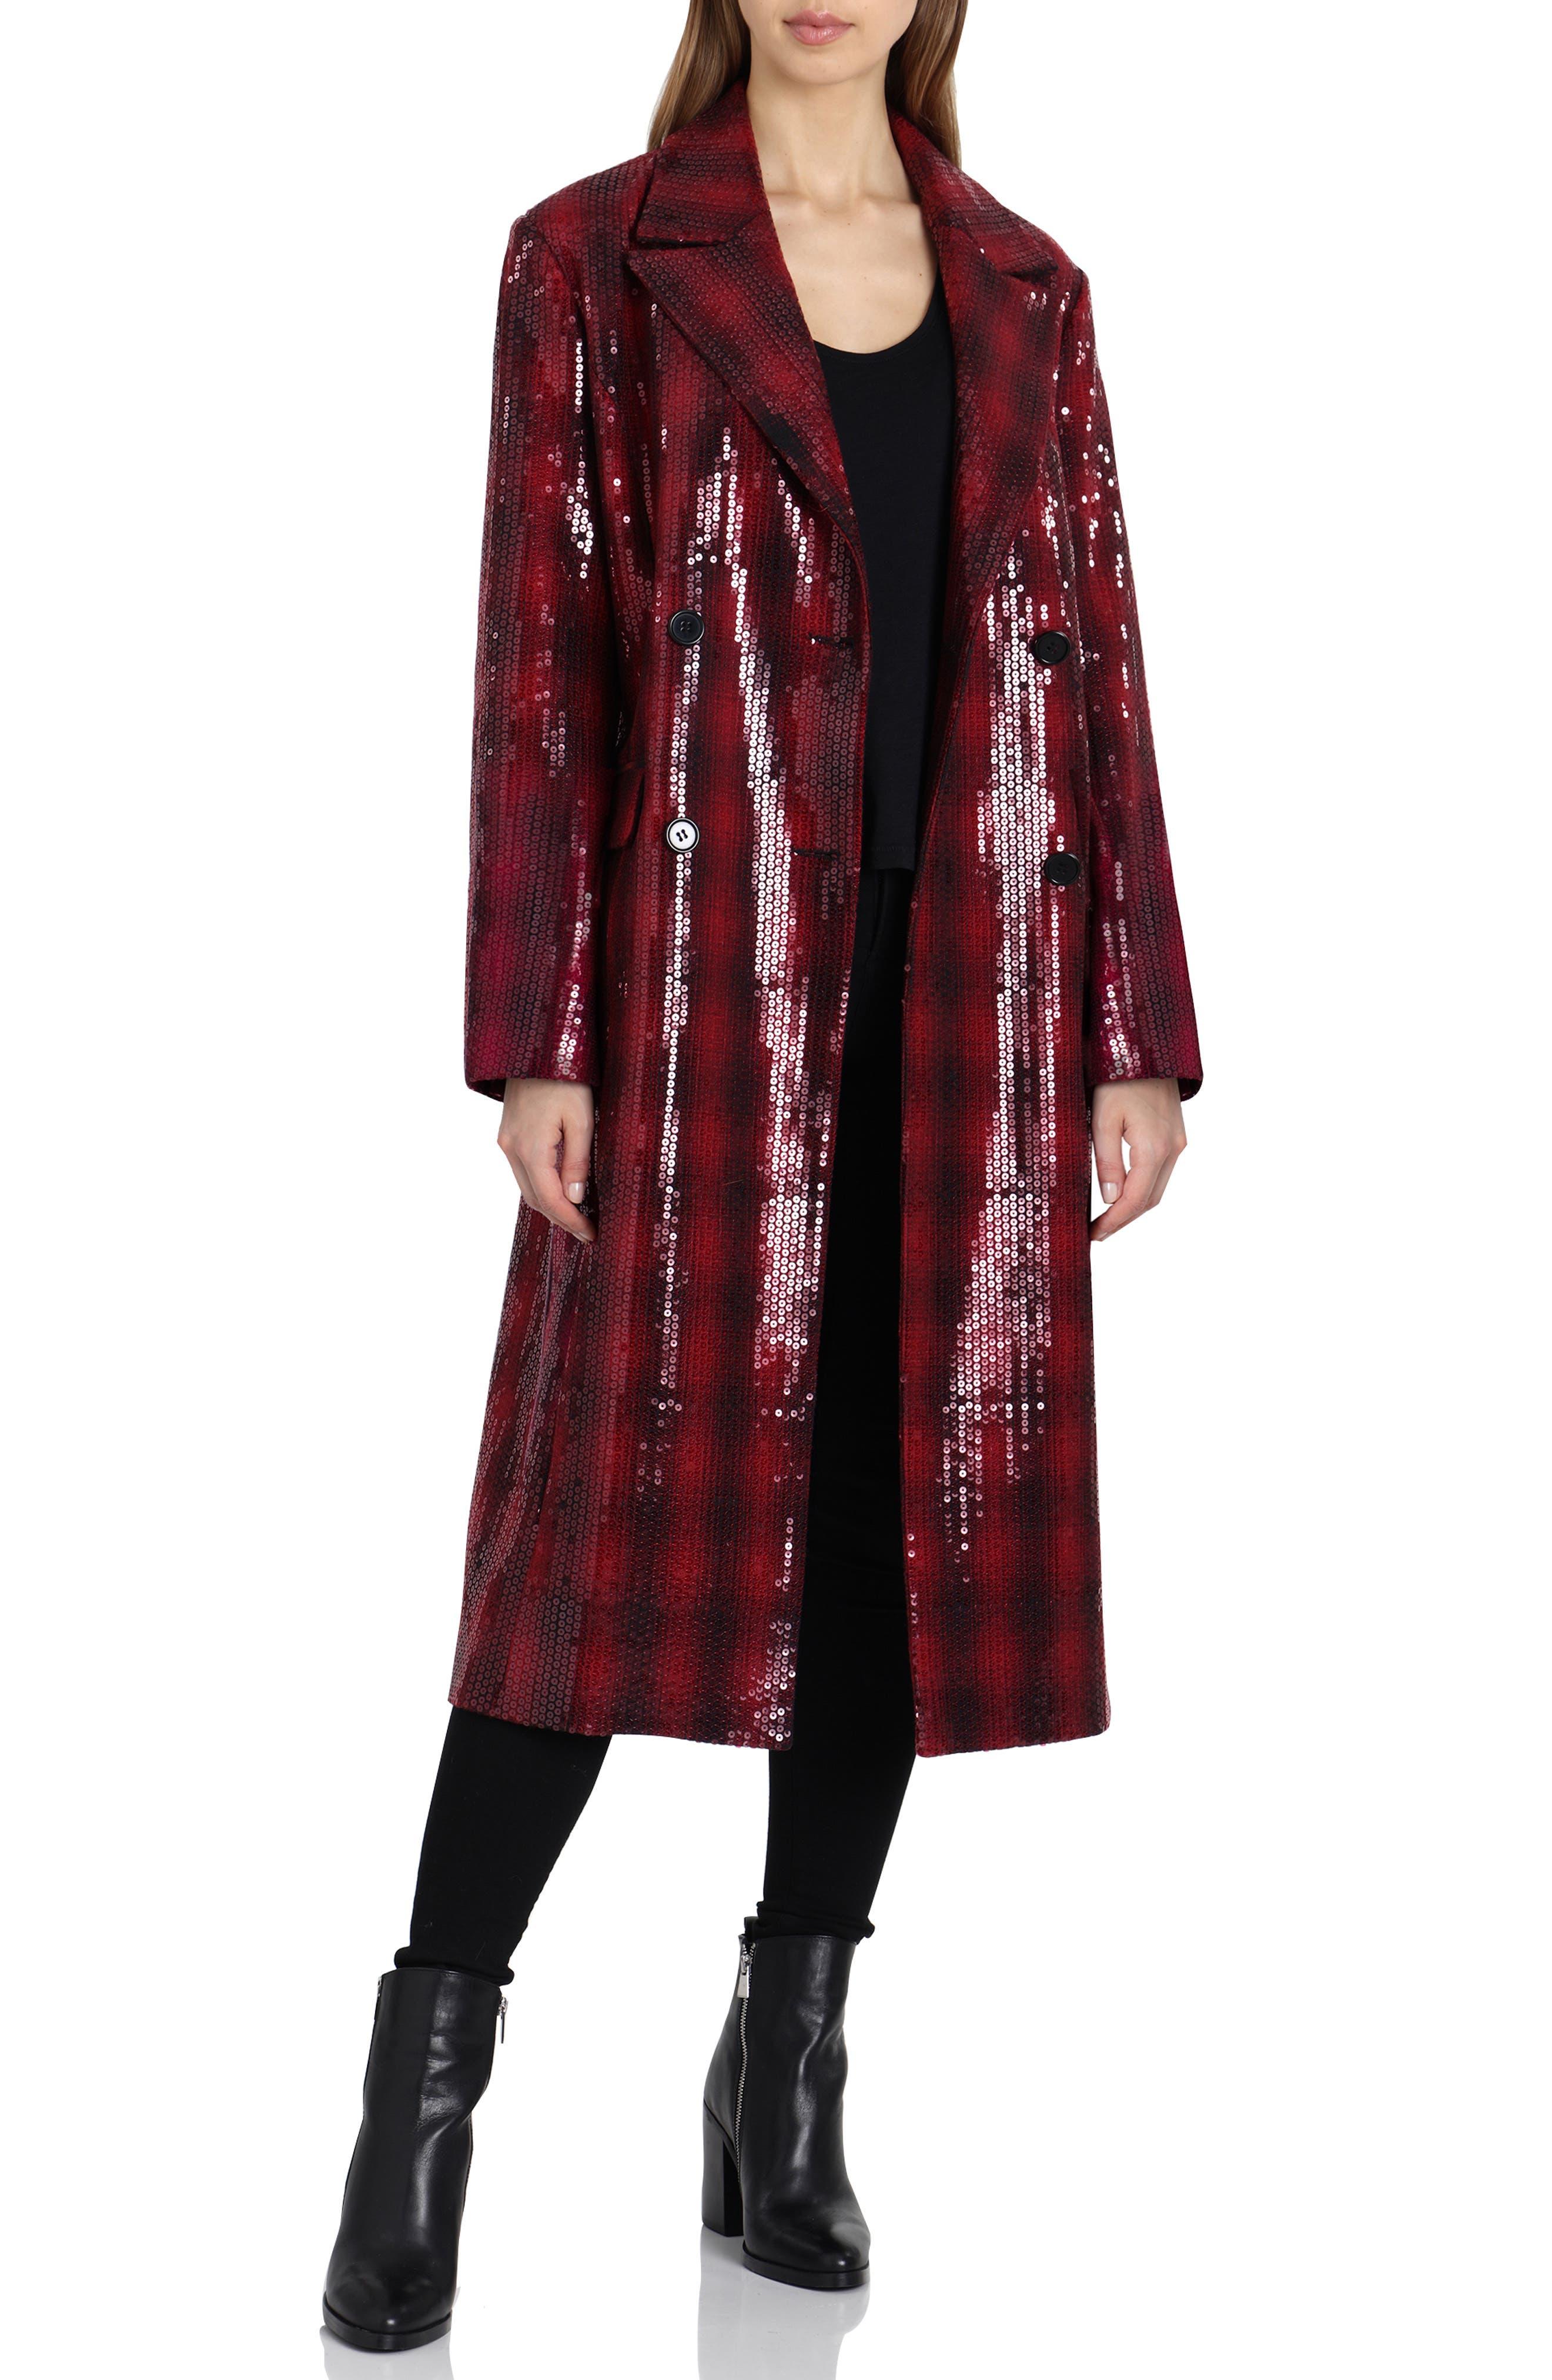 438bbee1fa9e0 Women s Badgley Mischka Collection Clothing Sale